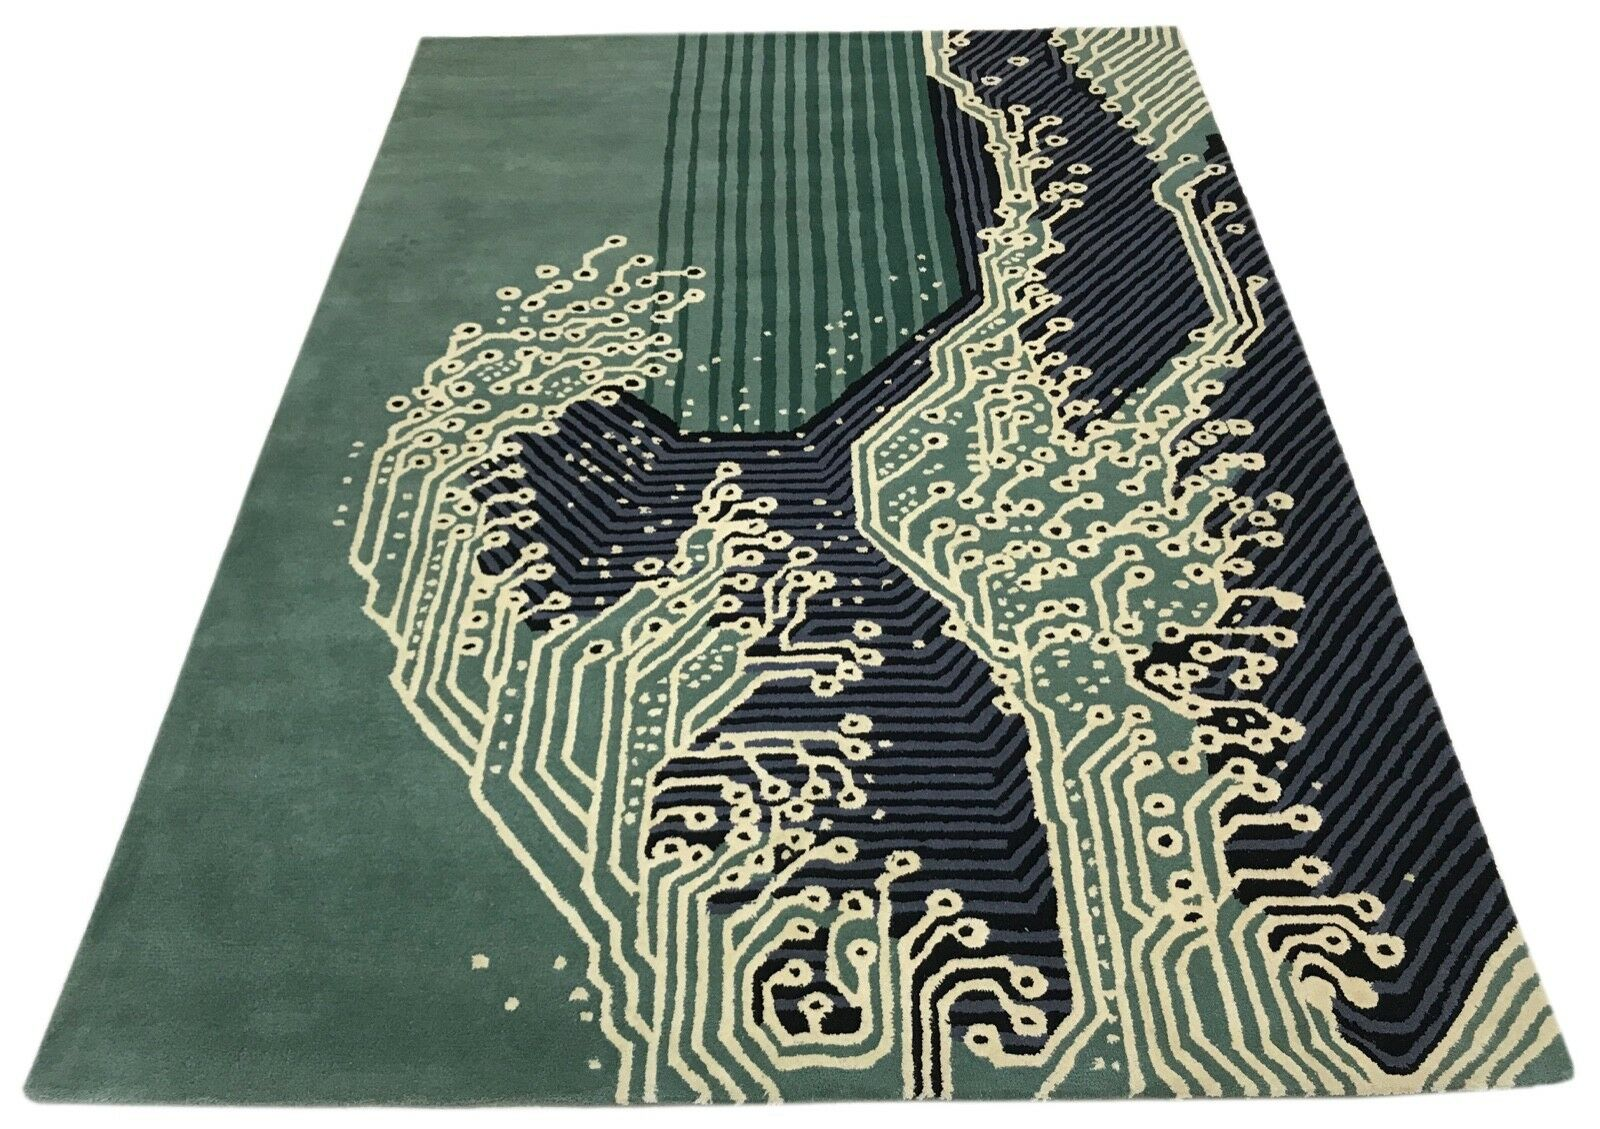 Scheda madre Designer Tappeto 170x240 cm fatto a mano  100% LANA-handgetuftet